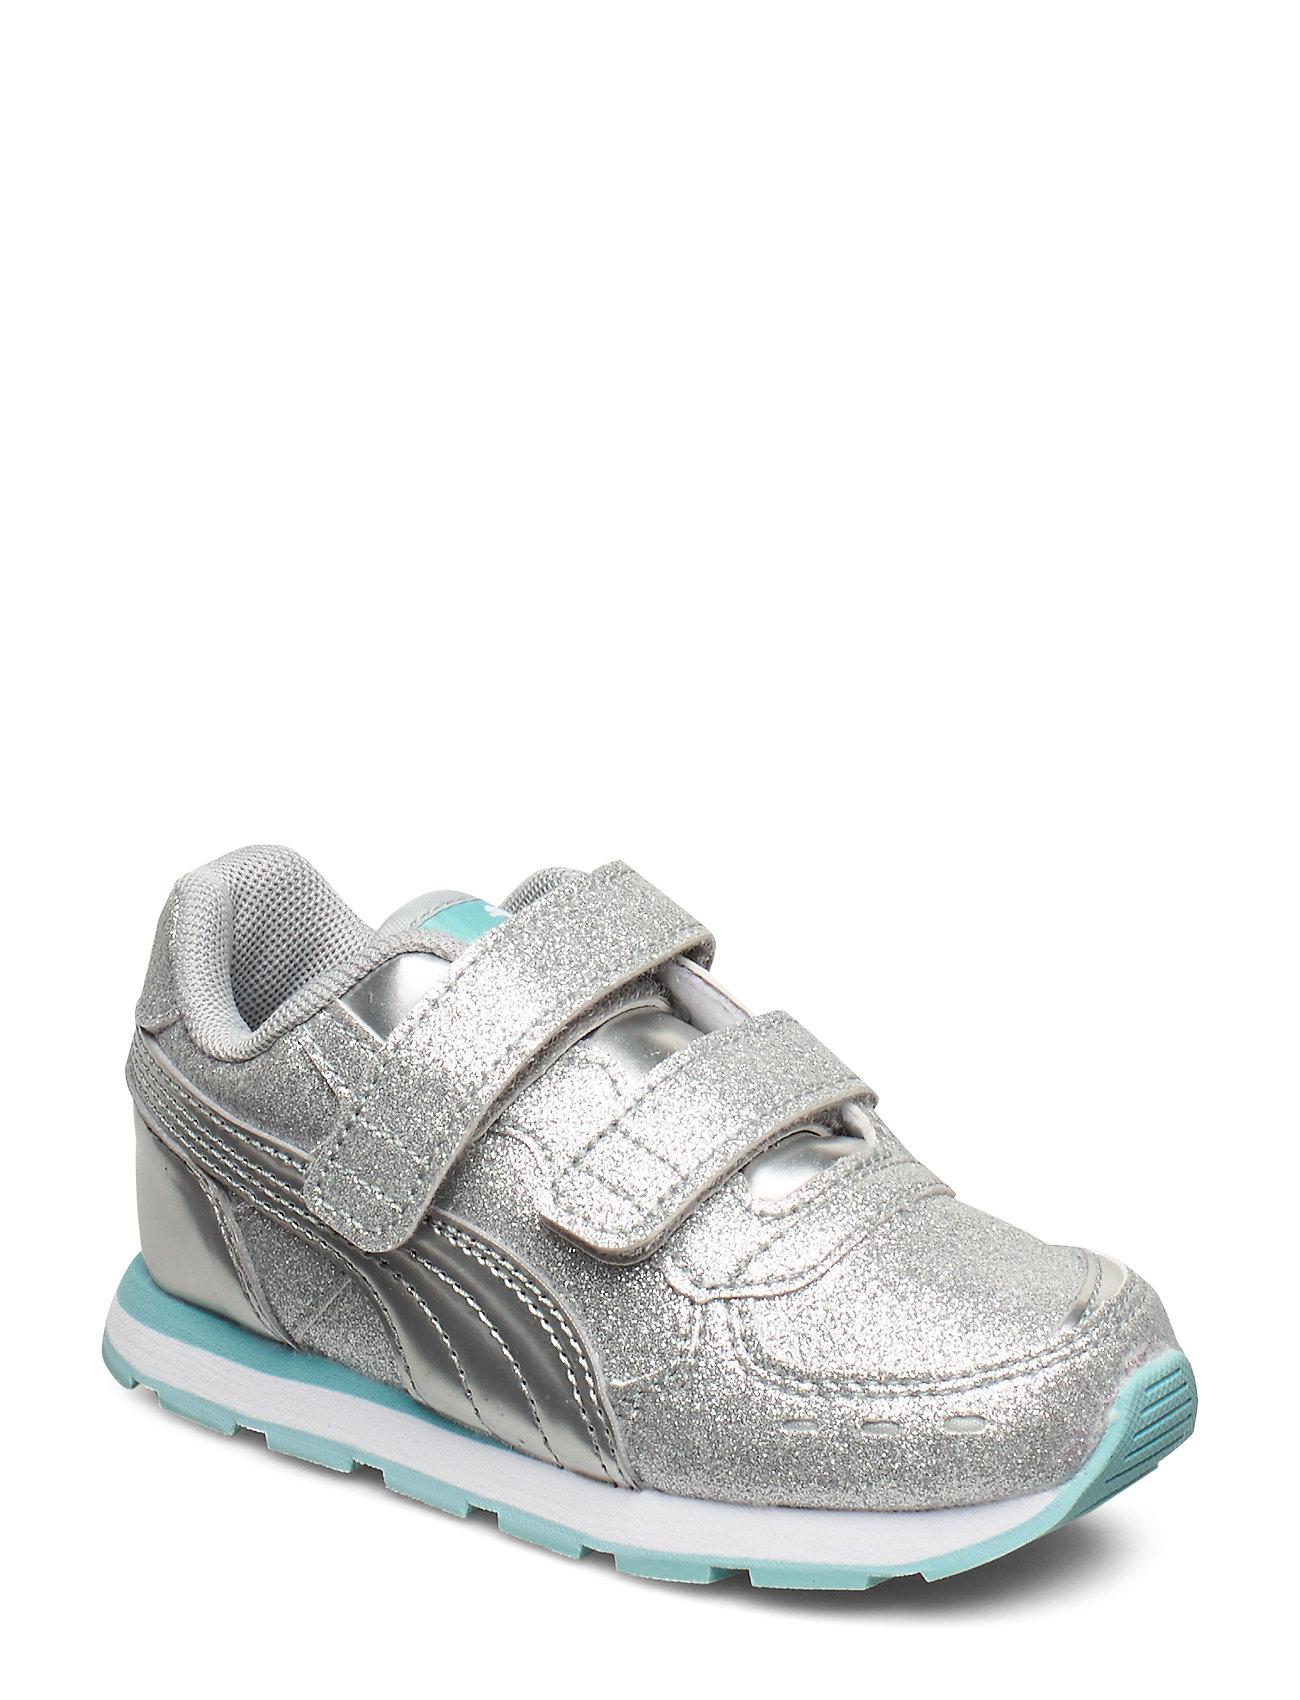 Puma sneakers Vista silver gulf stream